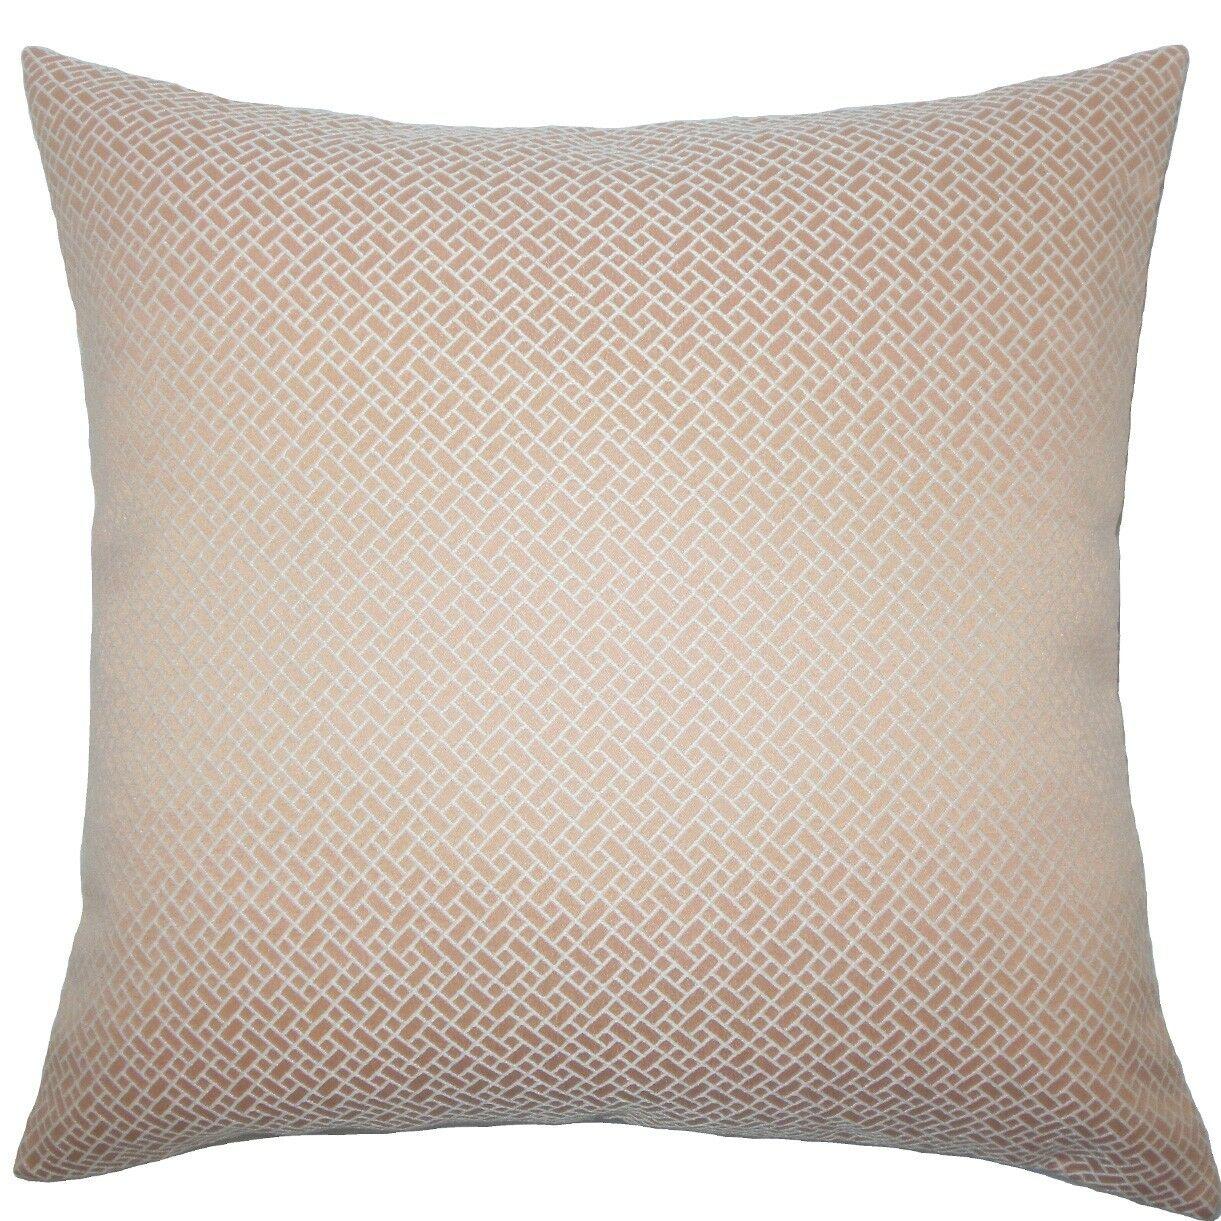 Pertessa Geometric Throw Pillow Color: Blush, Size: 22